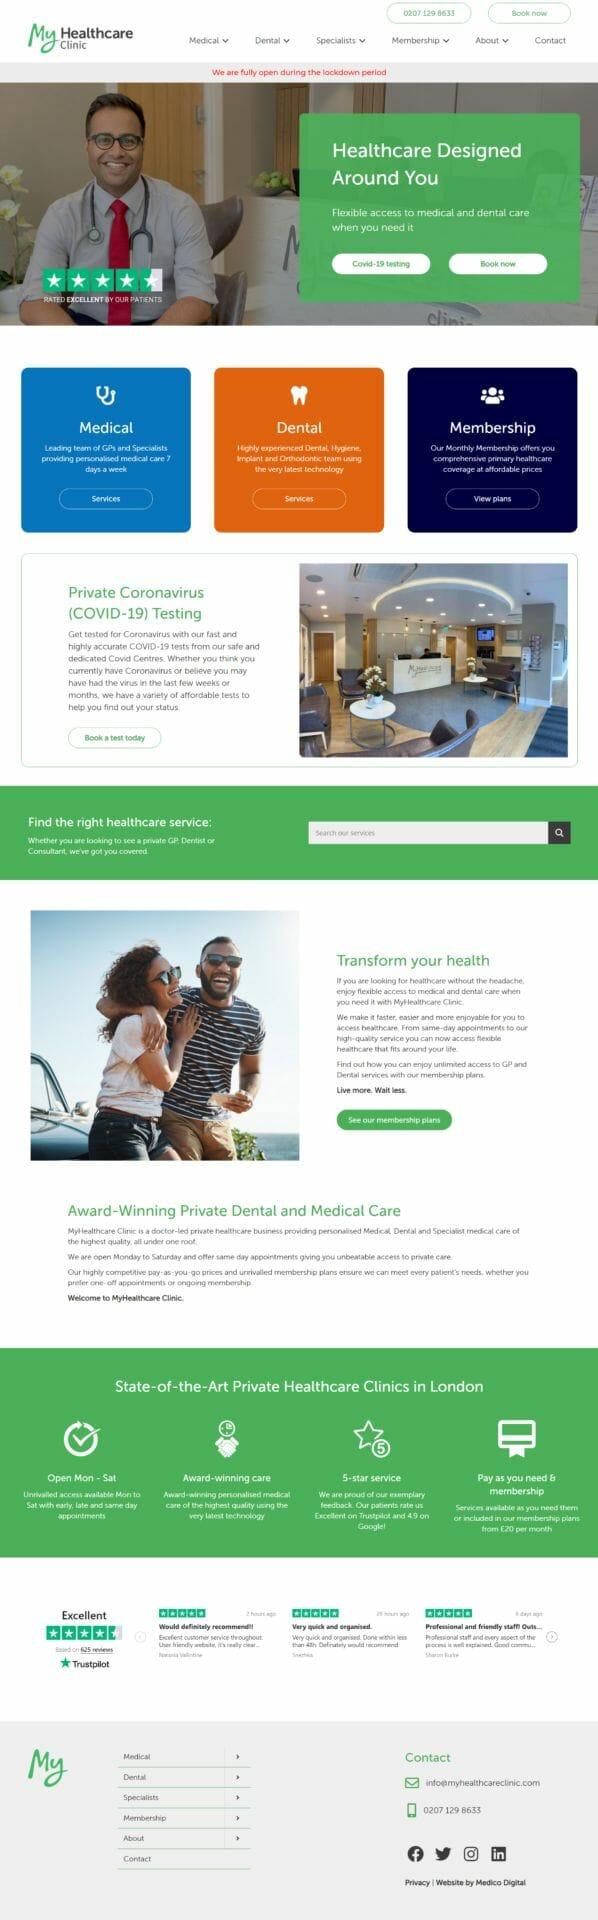 myhealthcareclinic.com